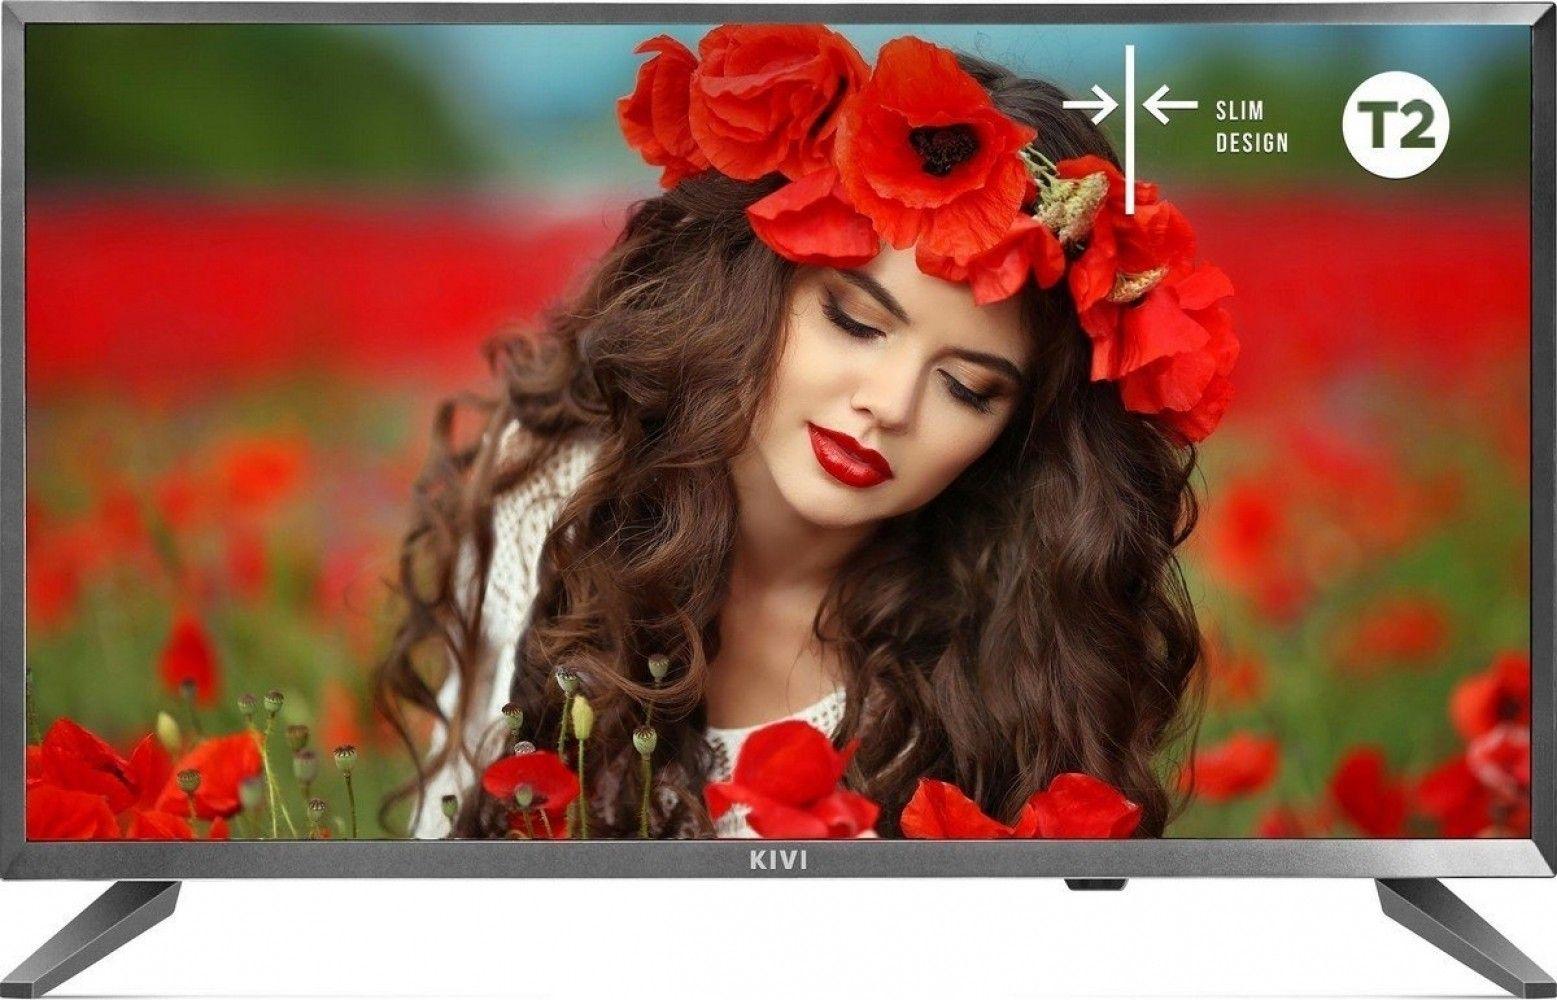 Купить Телевизор Kivi 32HK20G